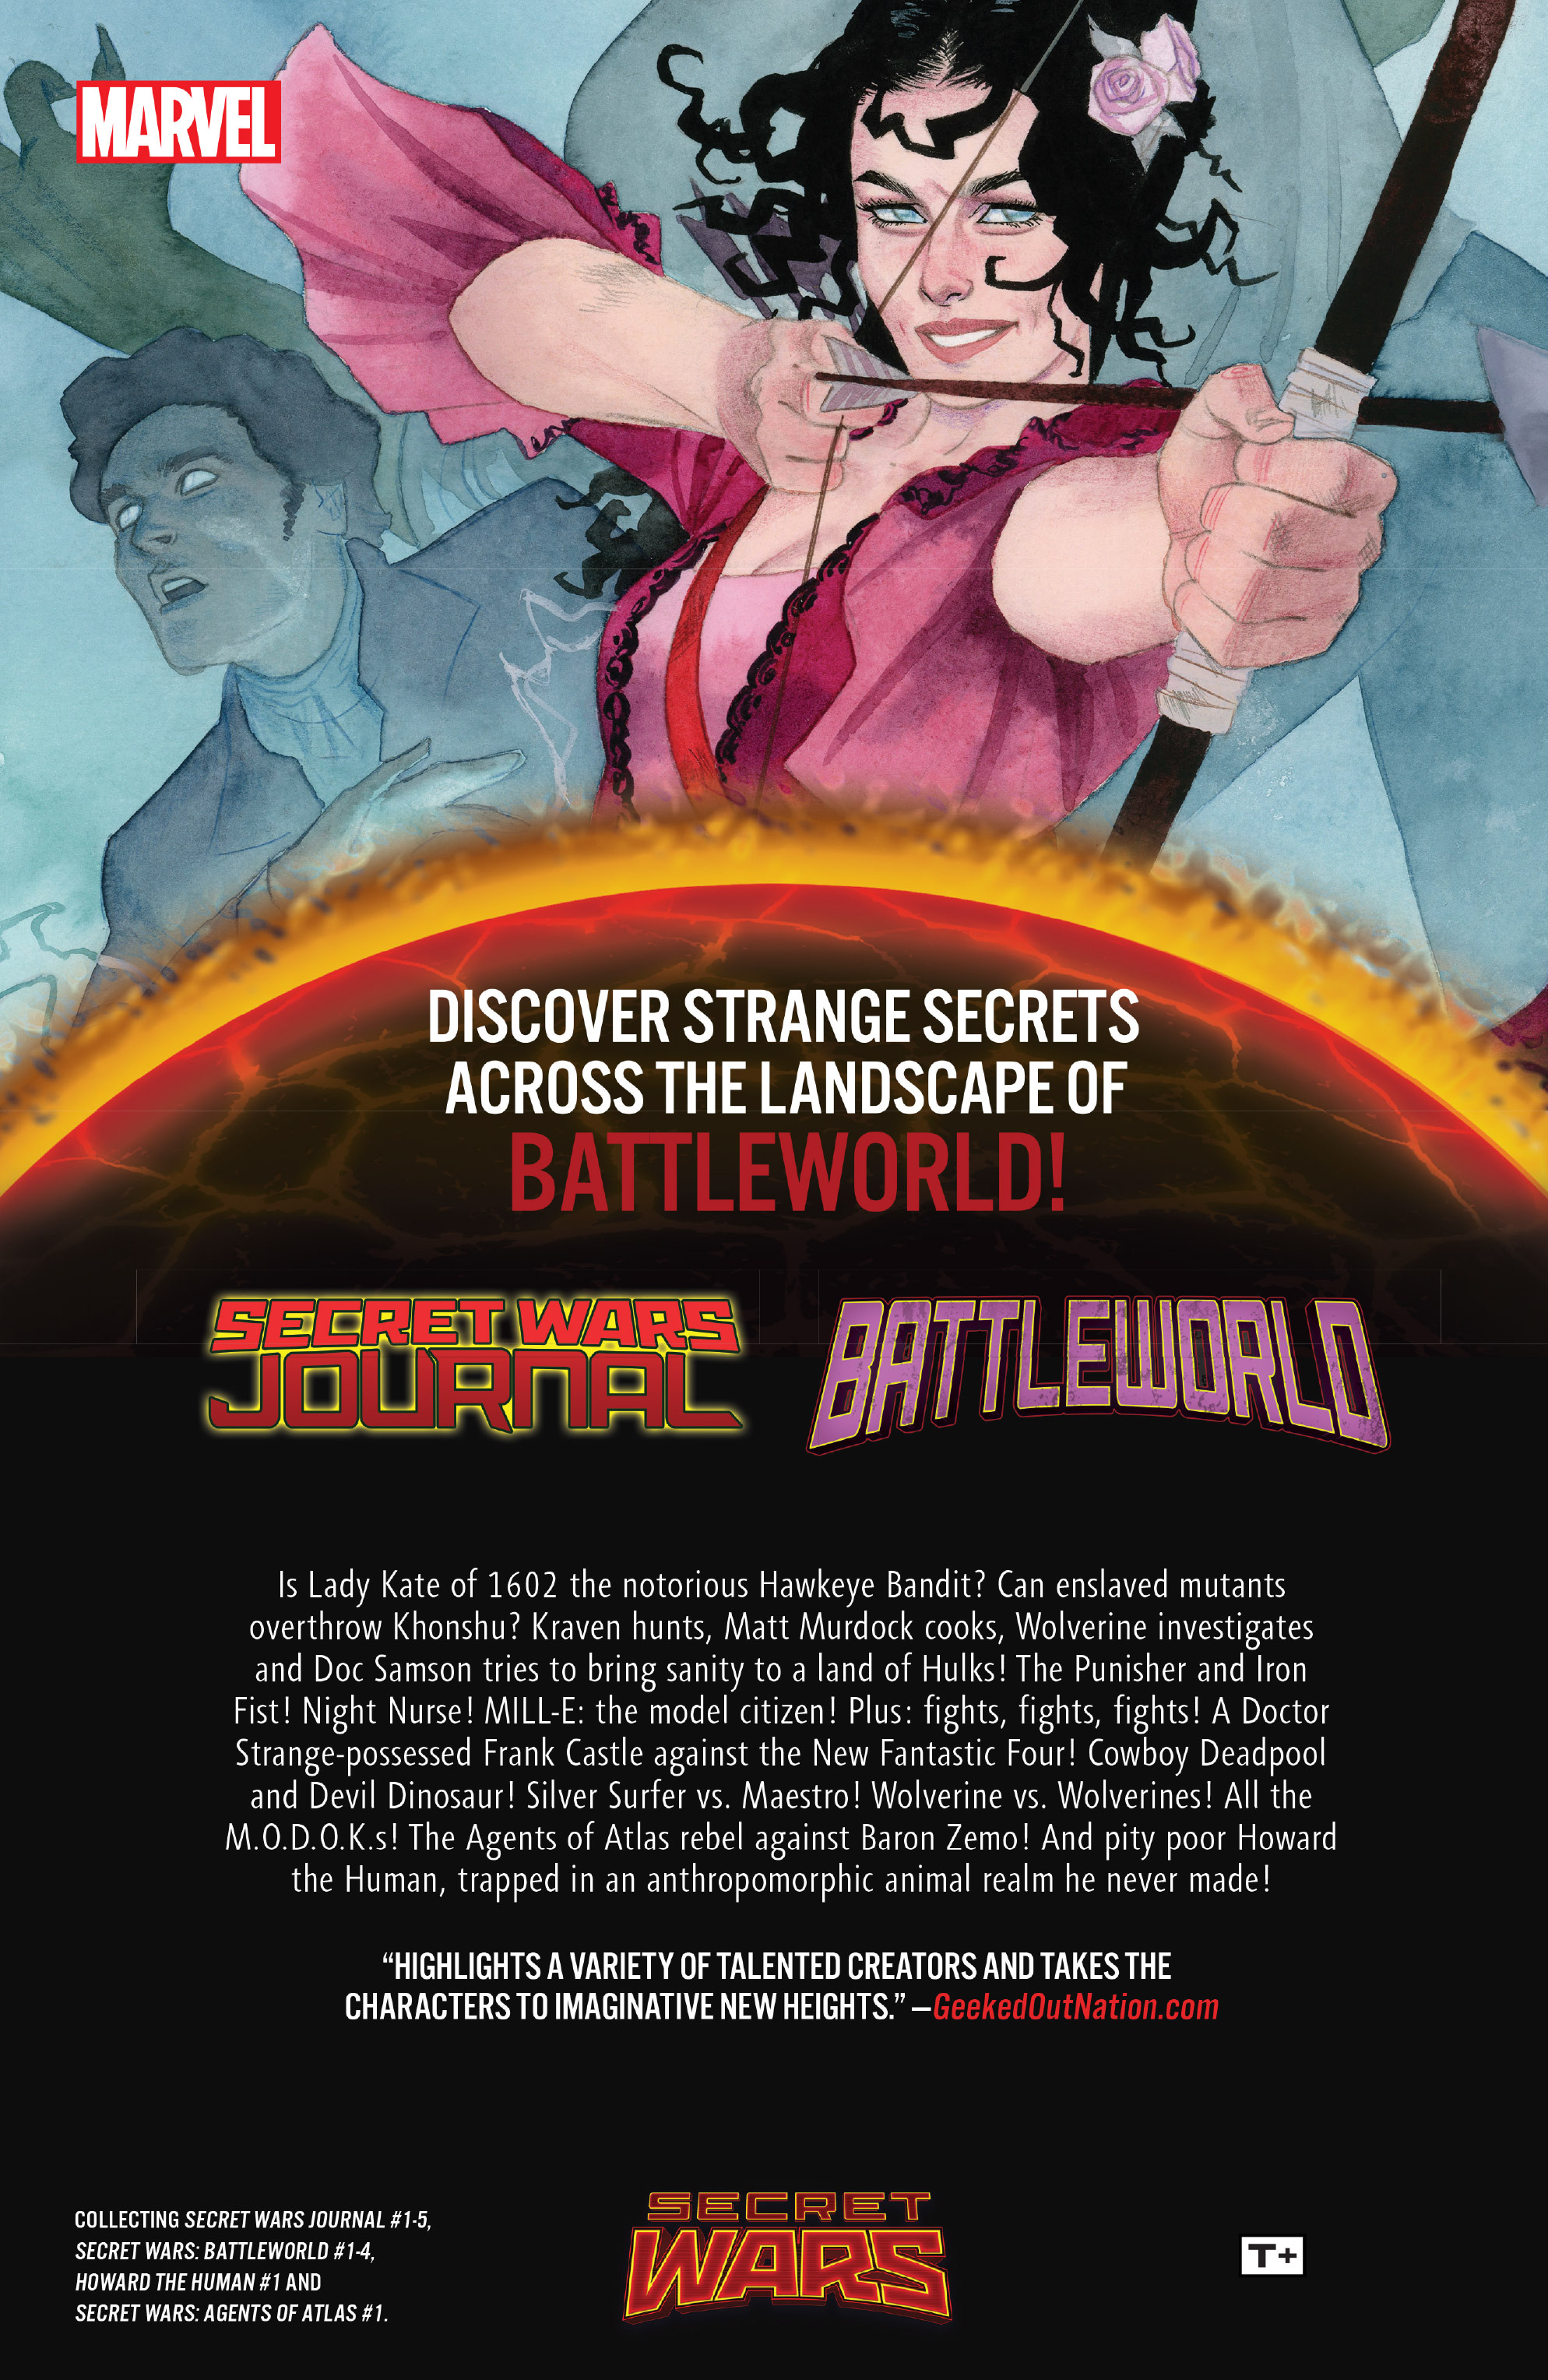 Read online Secret Wars Journal/Battleworld comic -  Issue # TPB - 232